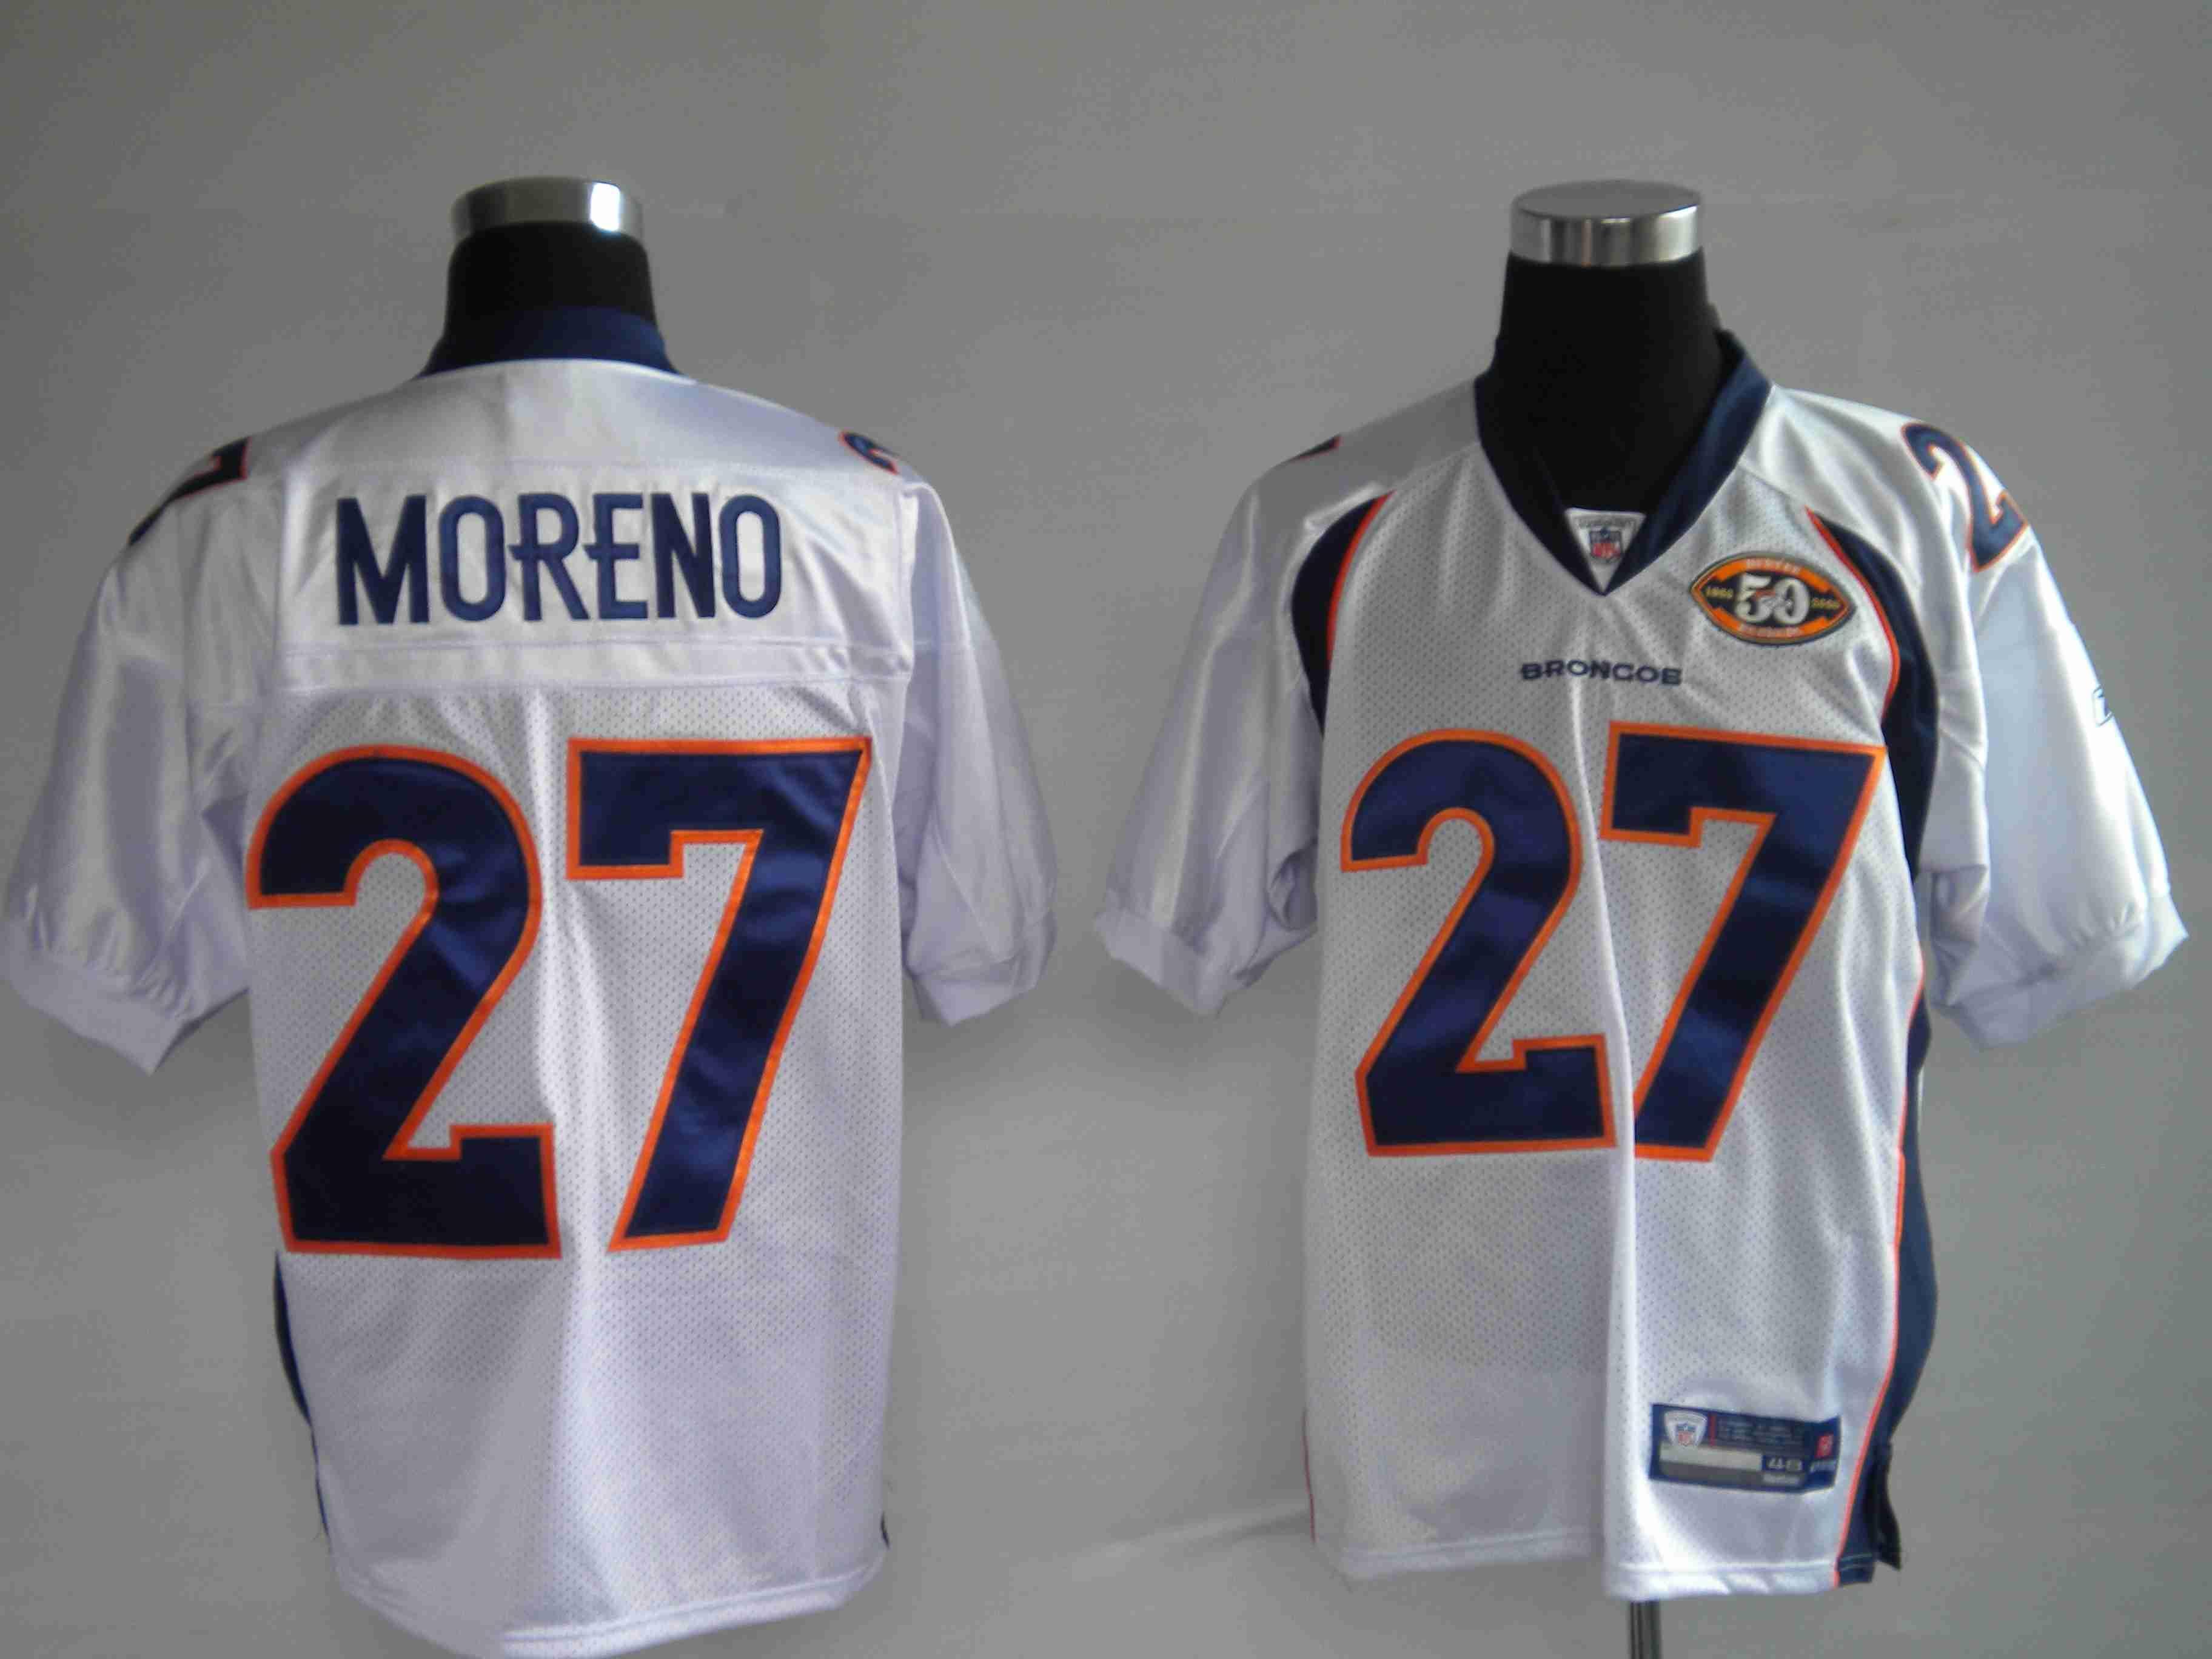 cheaper 467e9 e33d3 $25.00 50Th Reebok NFL Jersey Denver Broncos Knowshon Moreno ...